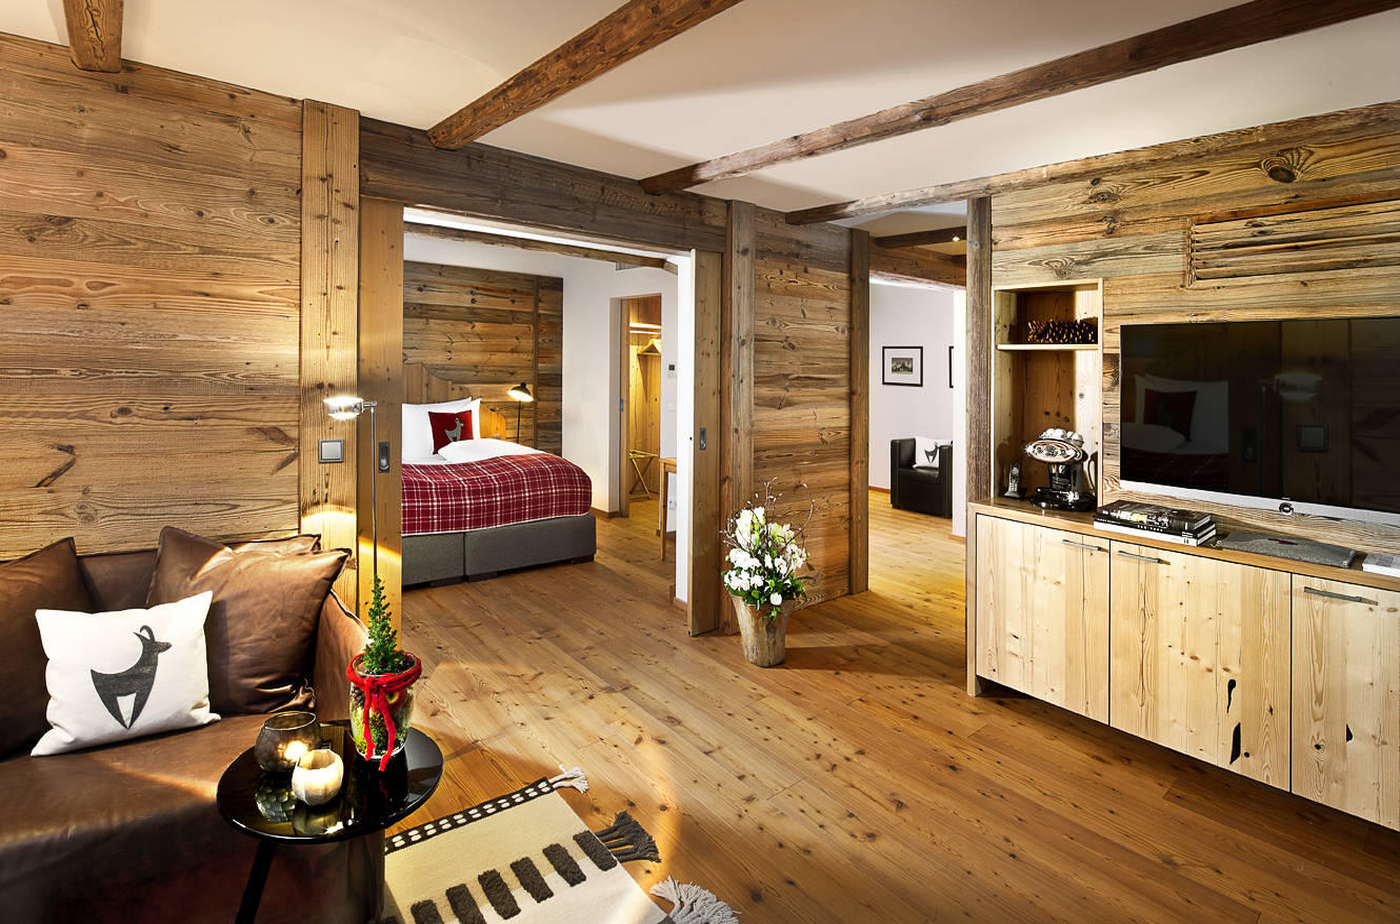 Hotel kitzhof mountain design resort in kitzb hel for Design hotels skiurlaub